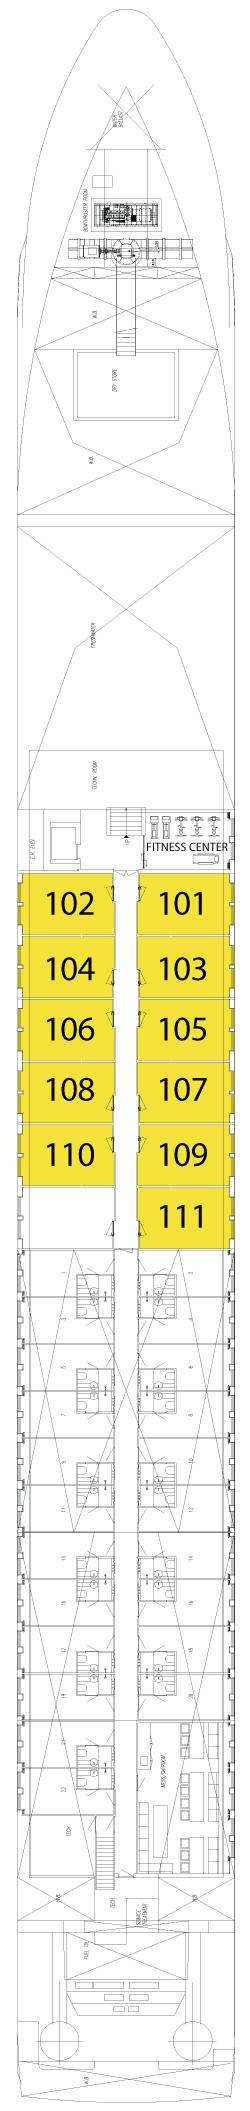 Indigo Deck